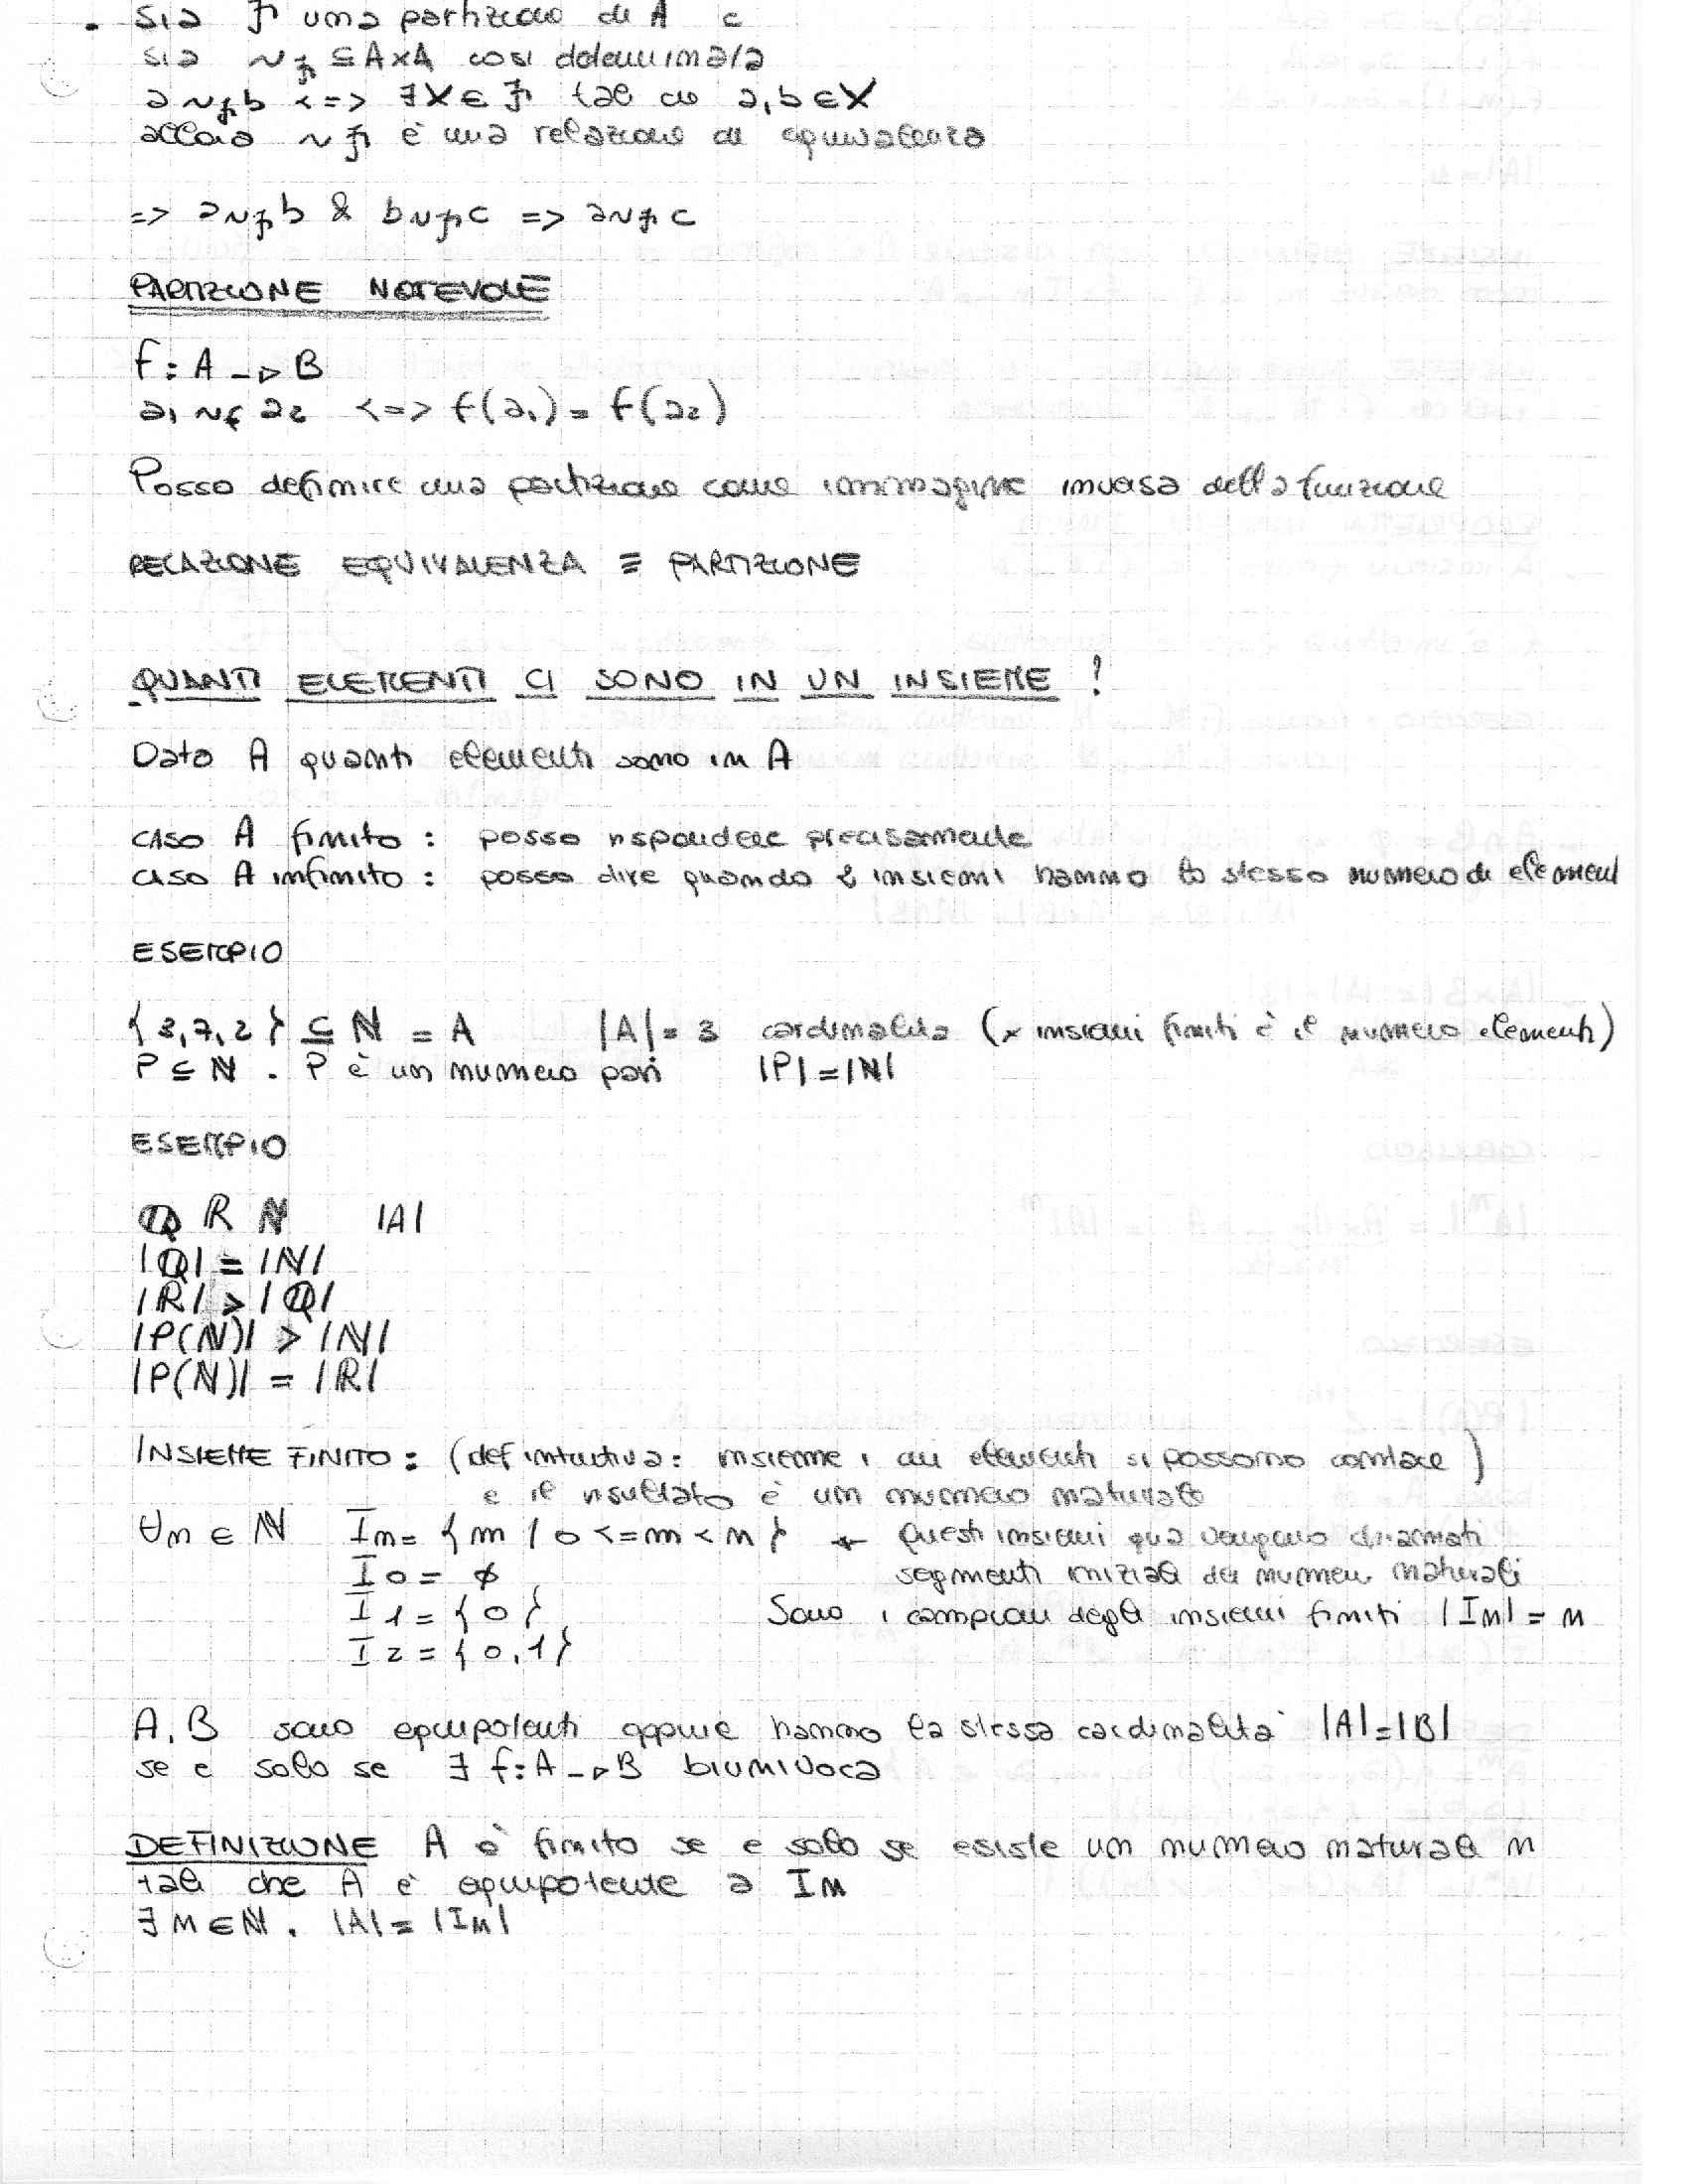 Logica e matematica discreta - Appunti Pag. 11